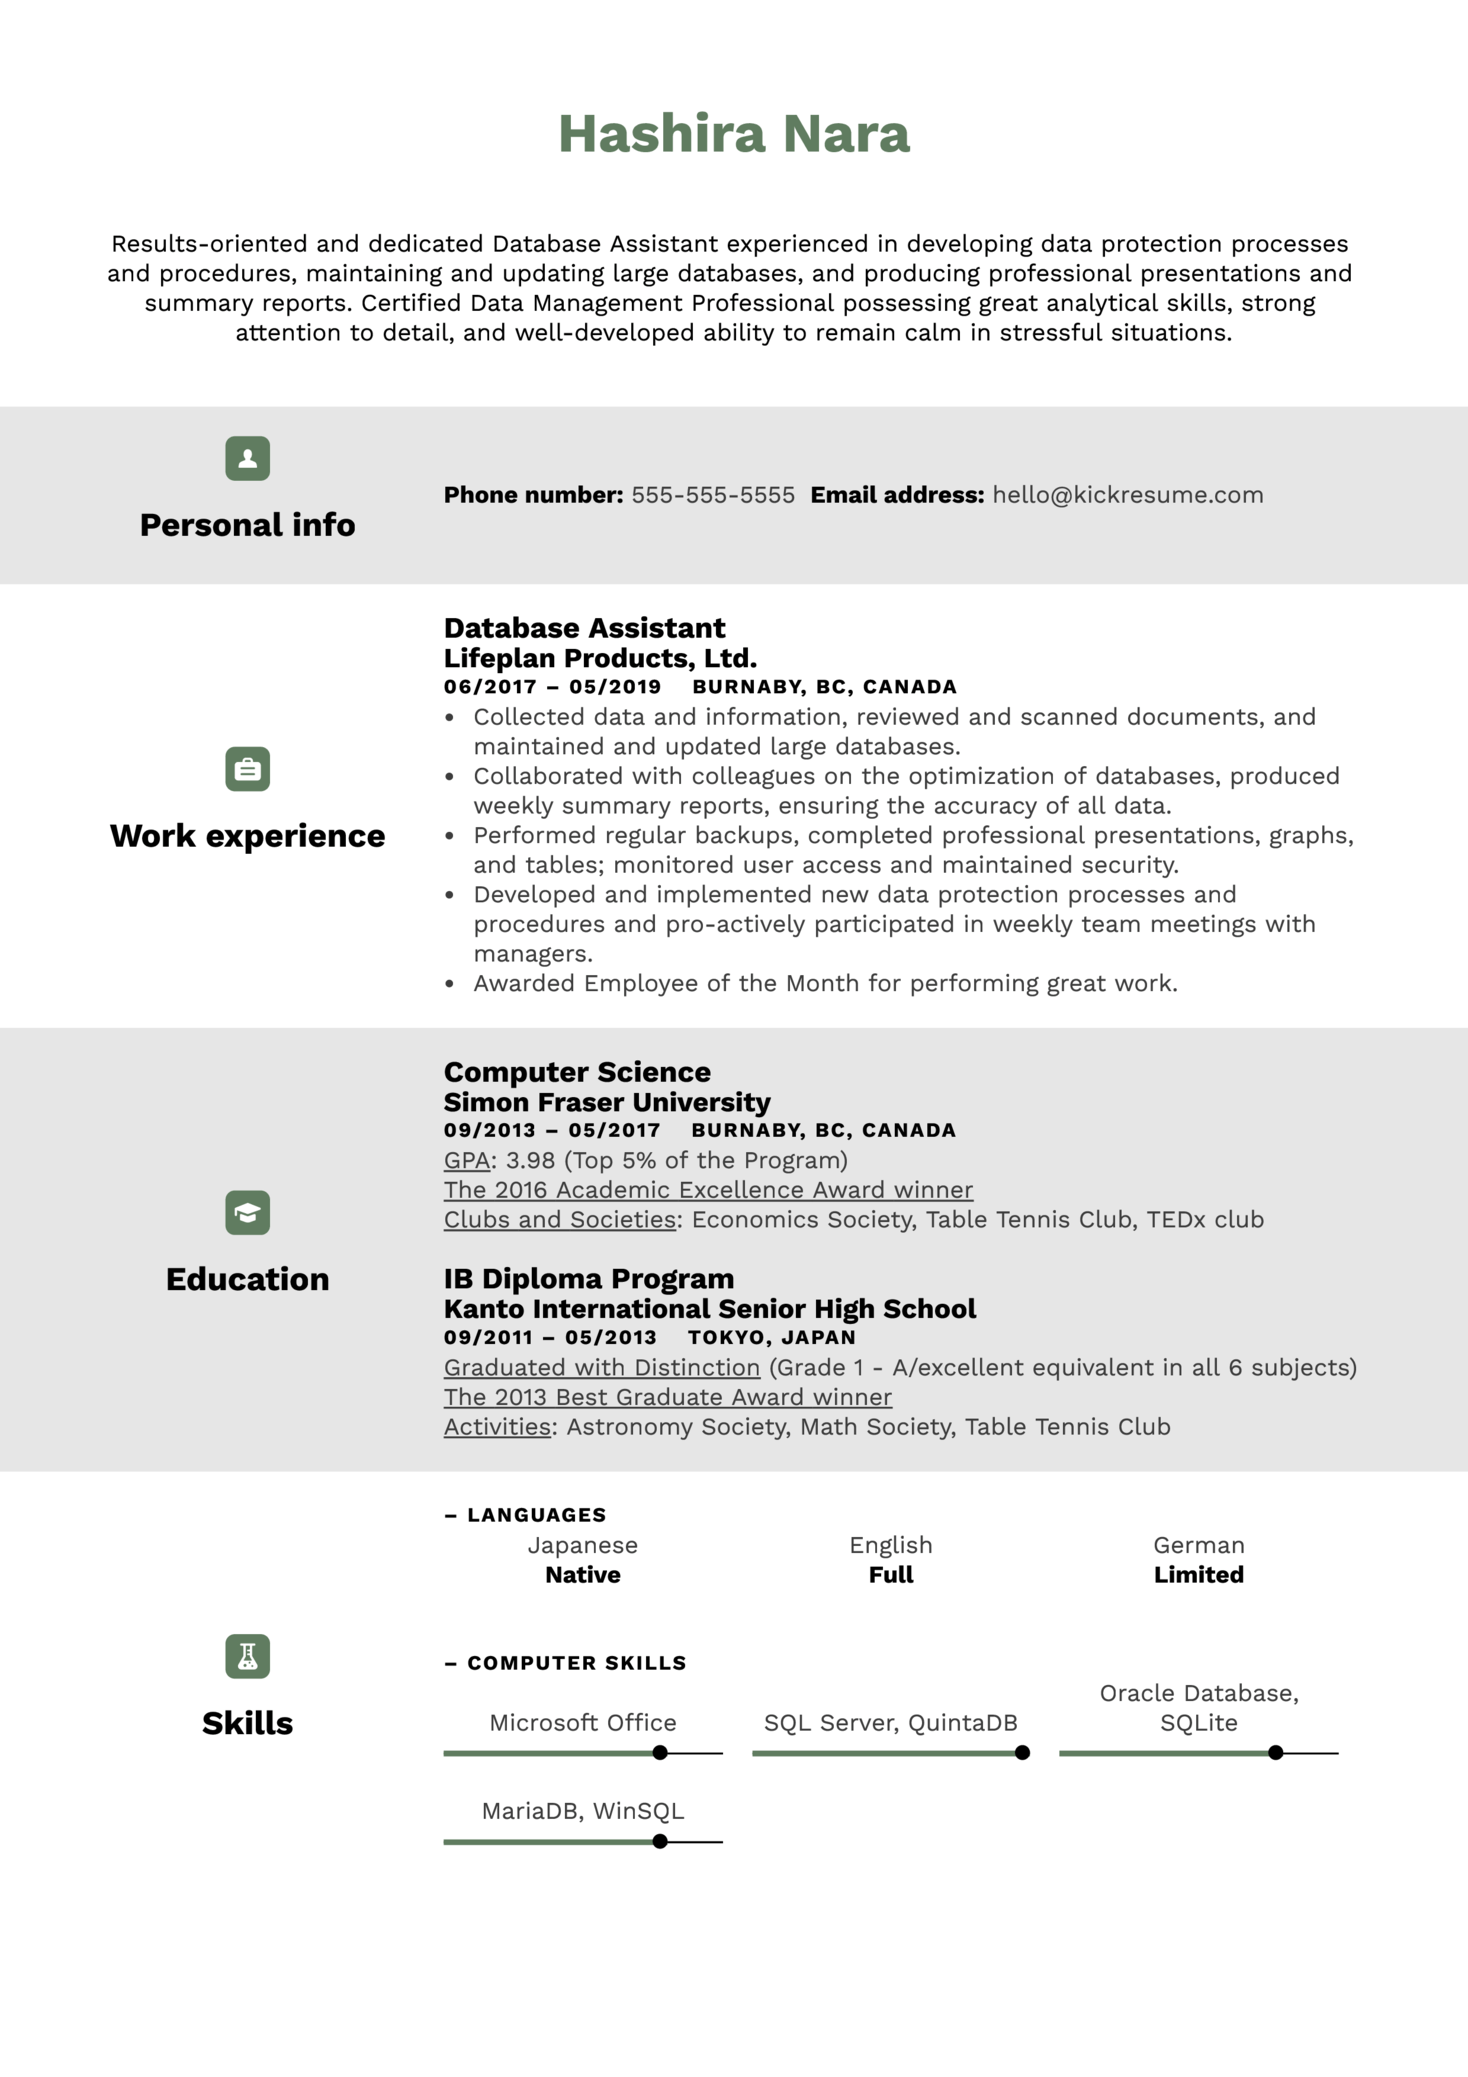 Database Assistant Resume Sample (Part 1)